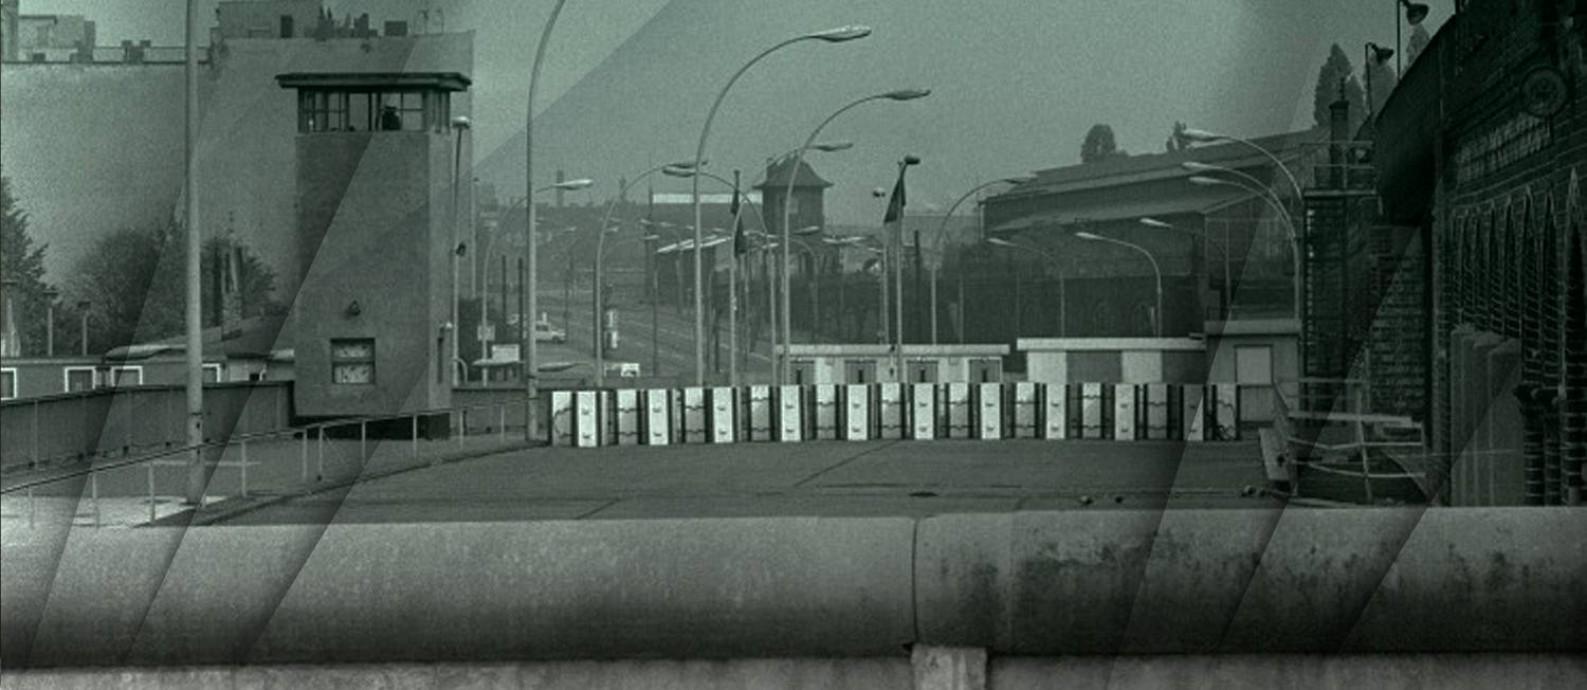 Muro de Berlim Foto: O Globo